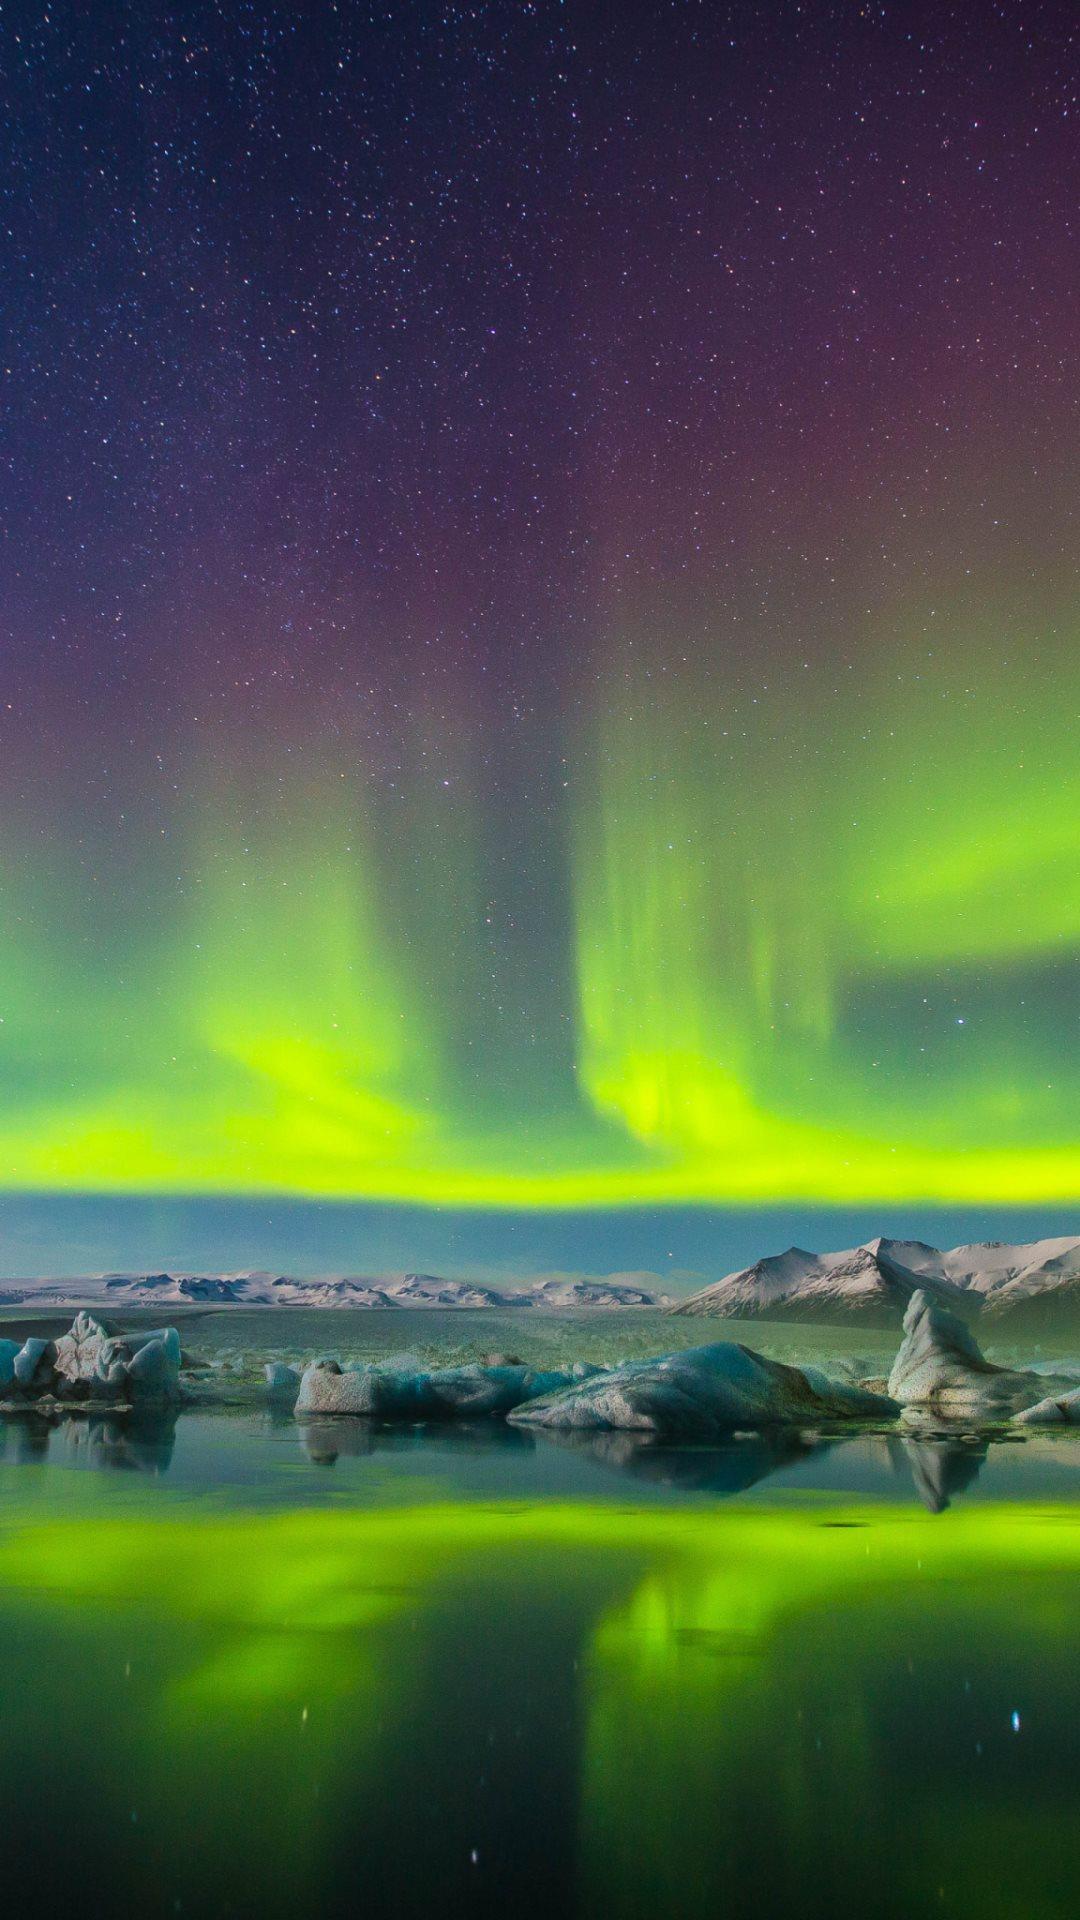 Aurora Borealis HD Wallpaper For Mobile